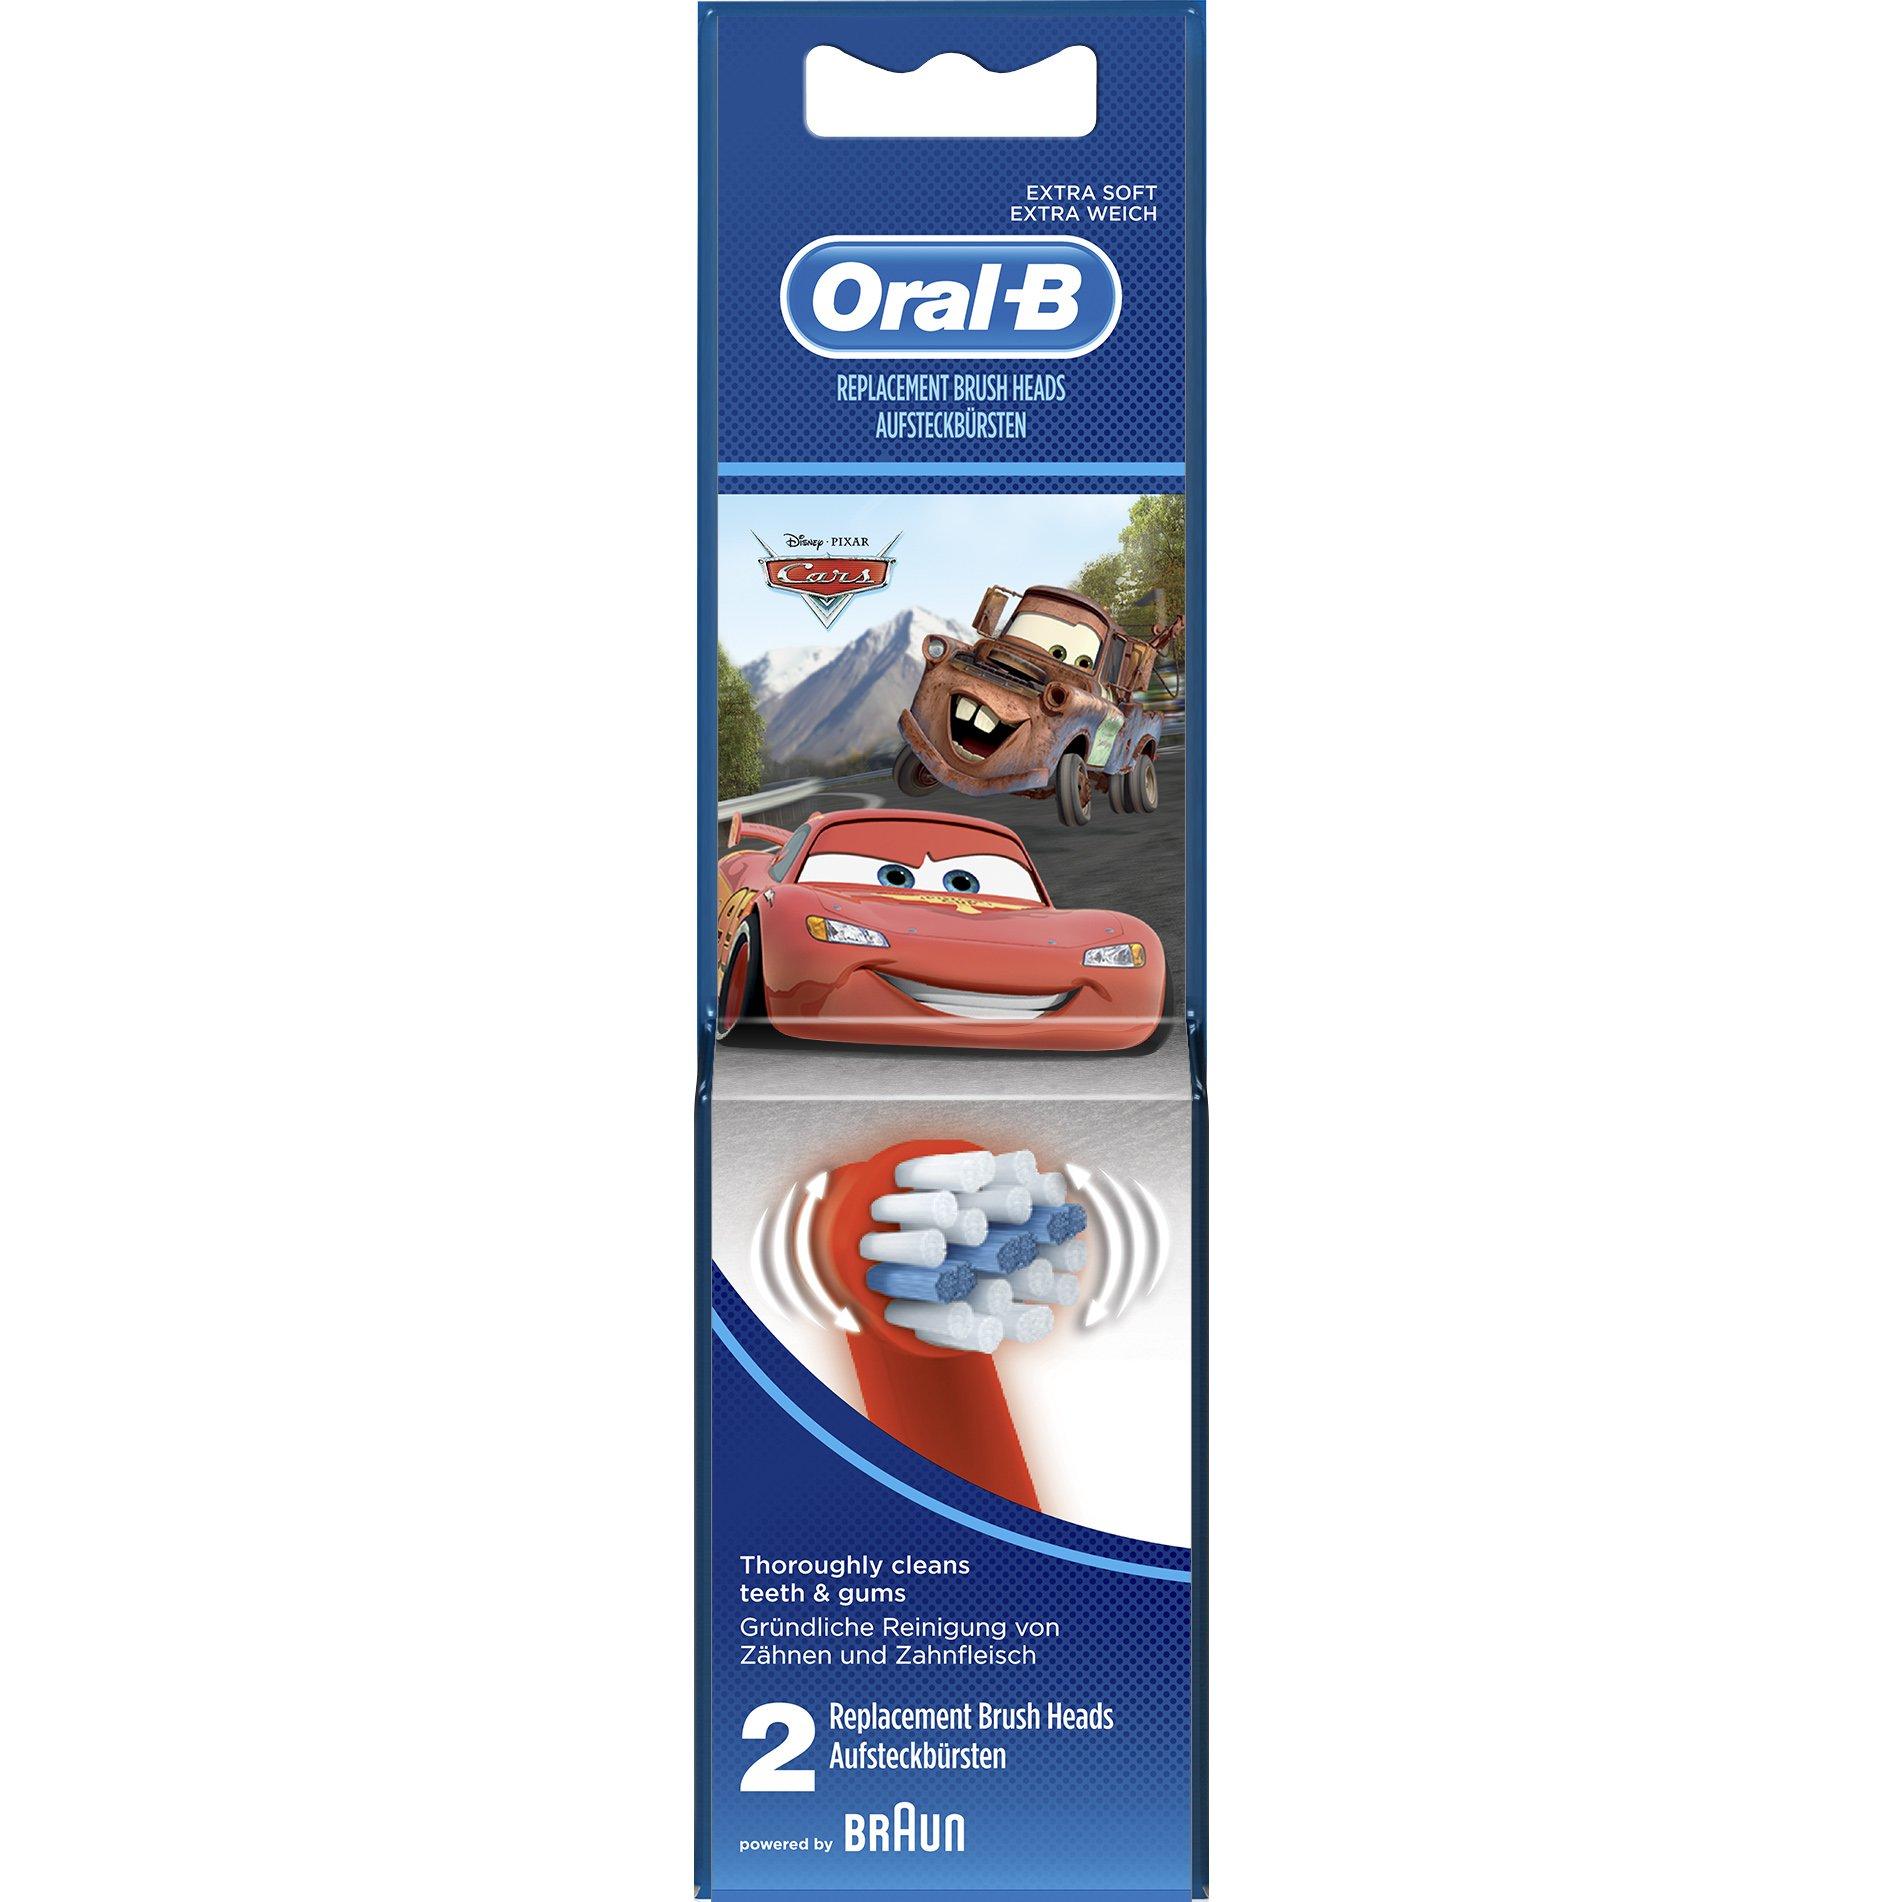 Oral-b Stages Ανταλλακτικές Κεφαλές Kids 2 Ανταλλακτικά